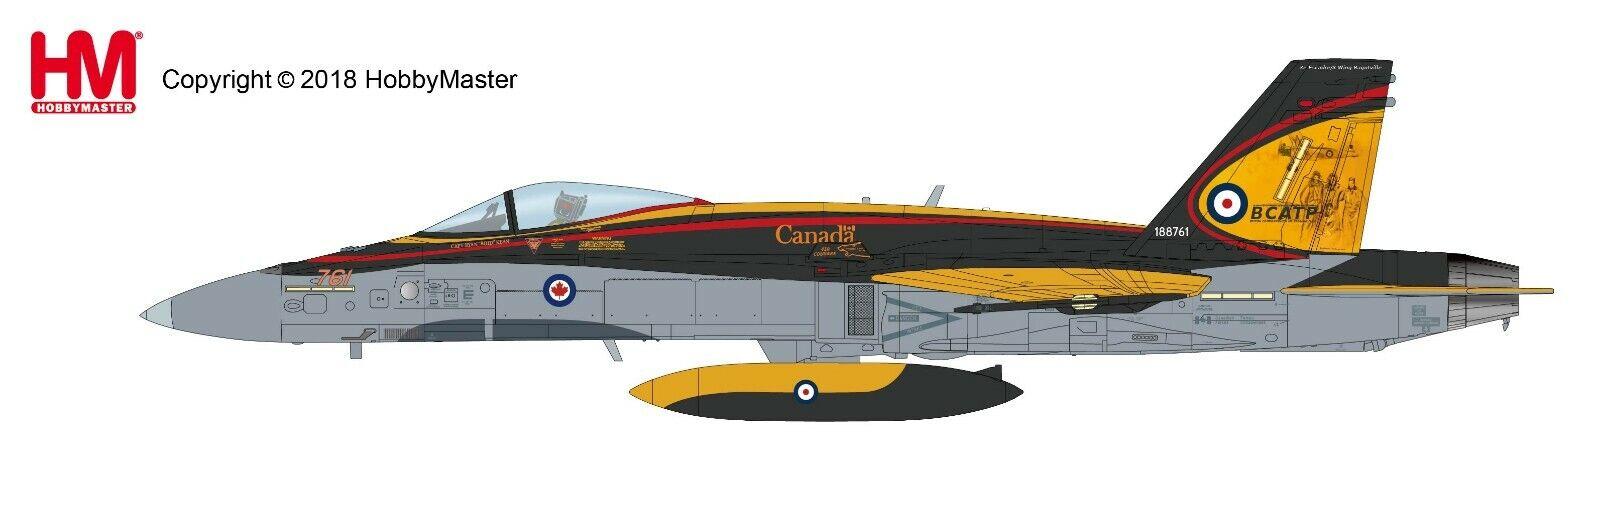 Hobby Master HA3550, CF-188  2016 Demo  Capitán Ryan  Roid  Kean, 2016